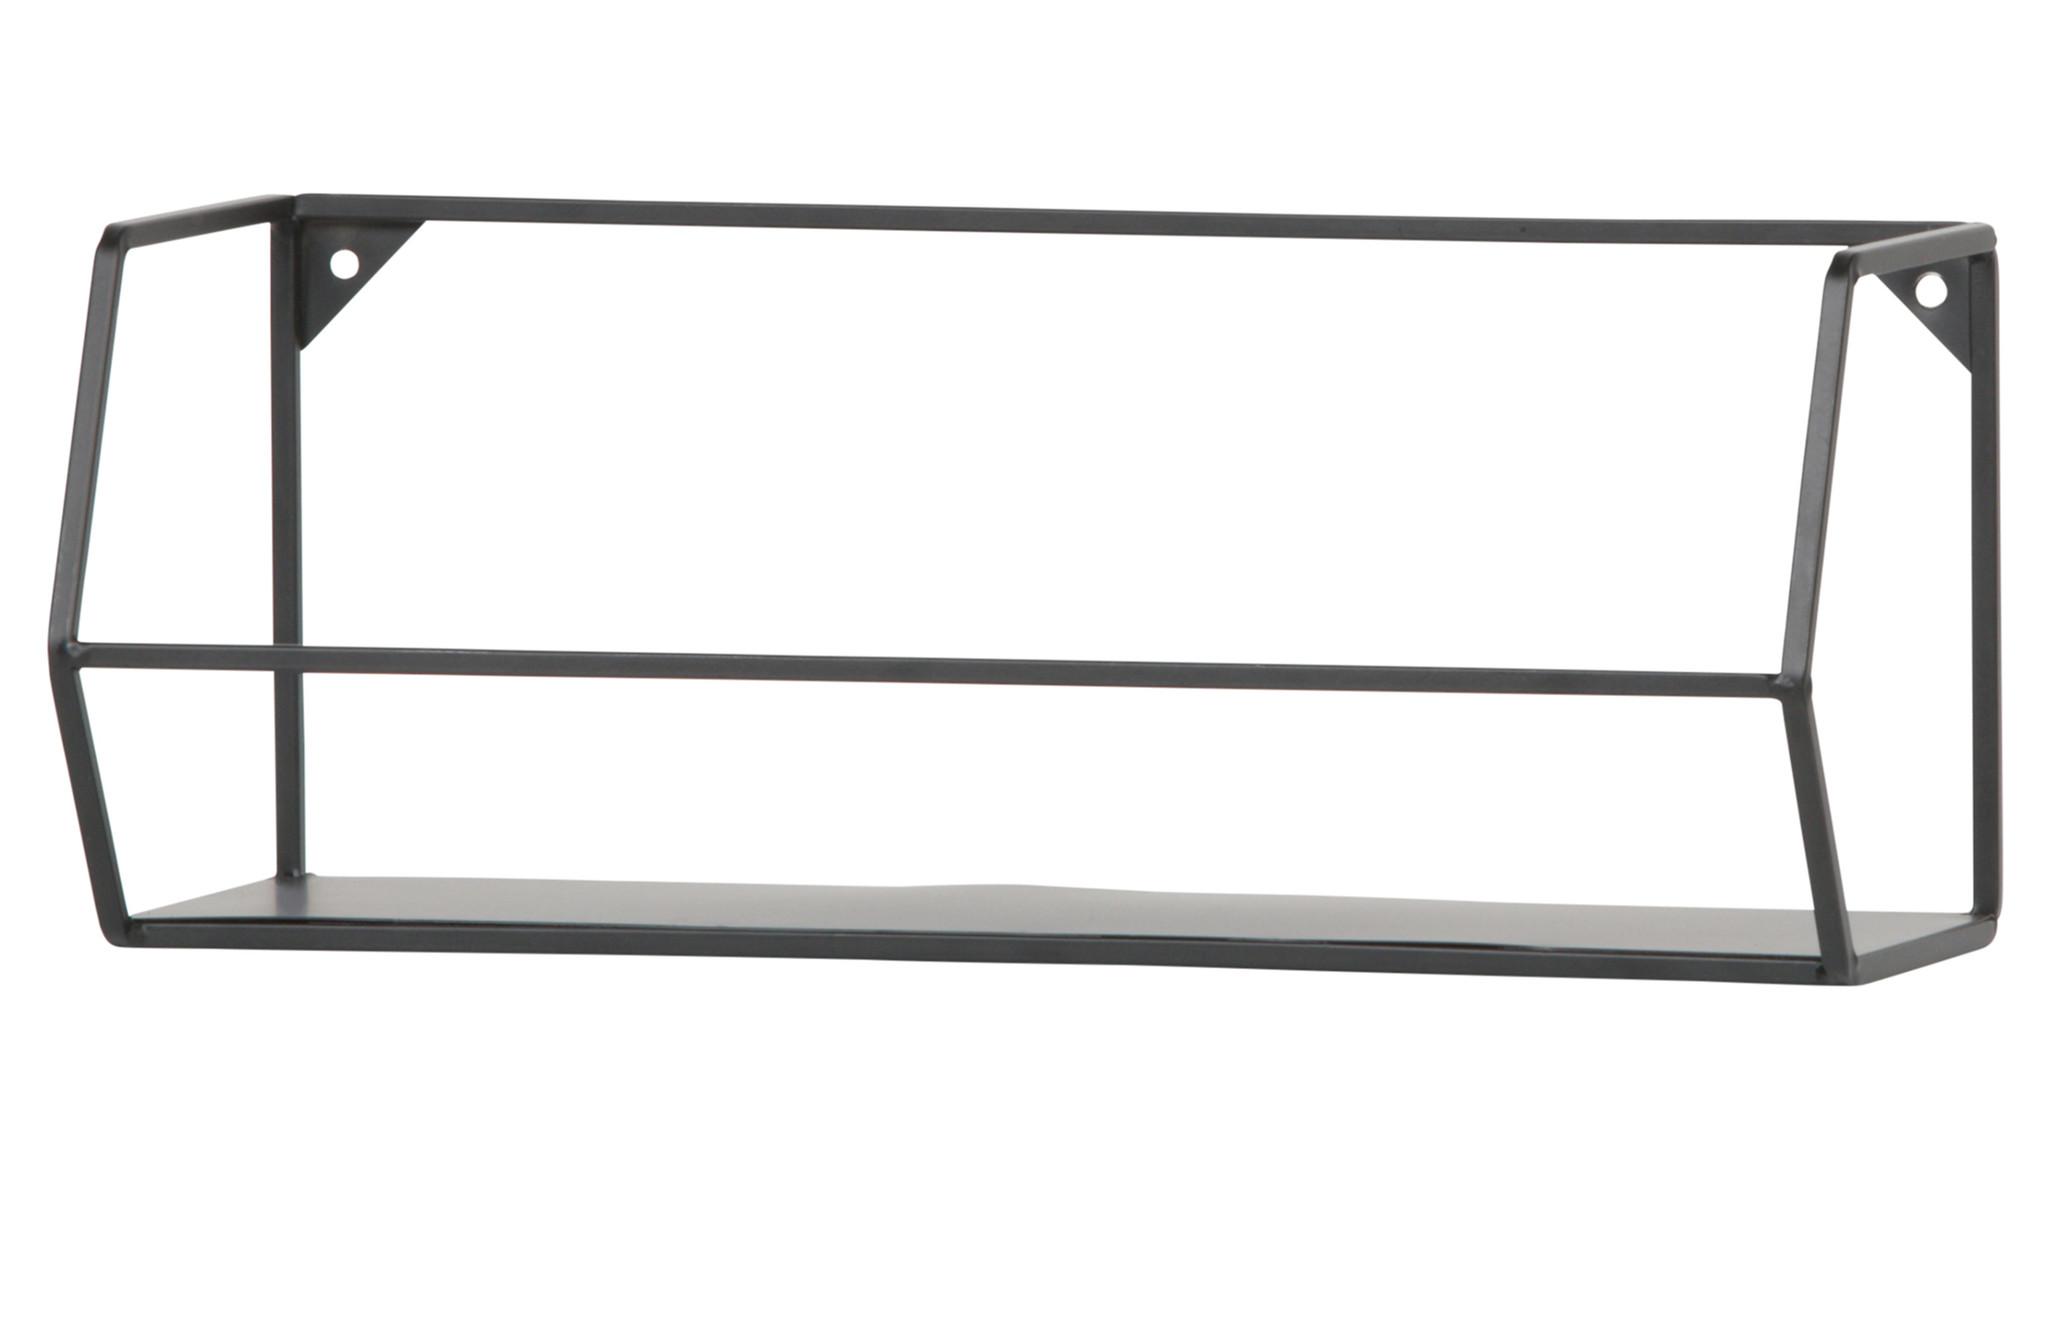 Woood wandplank Zeta, zwart, 40 of 80 cm